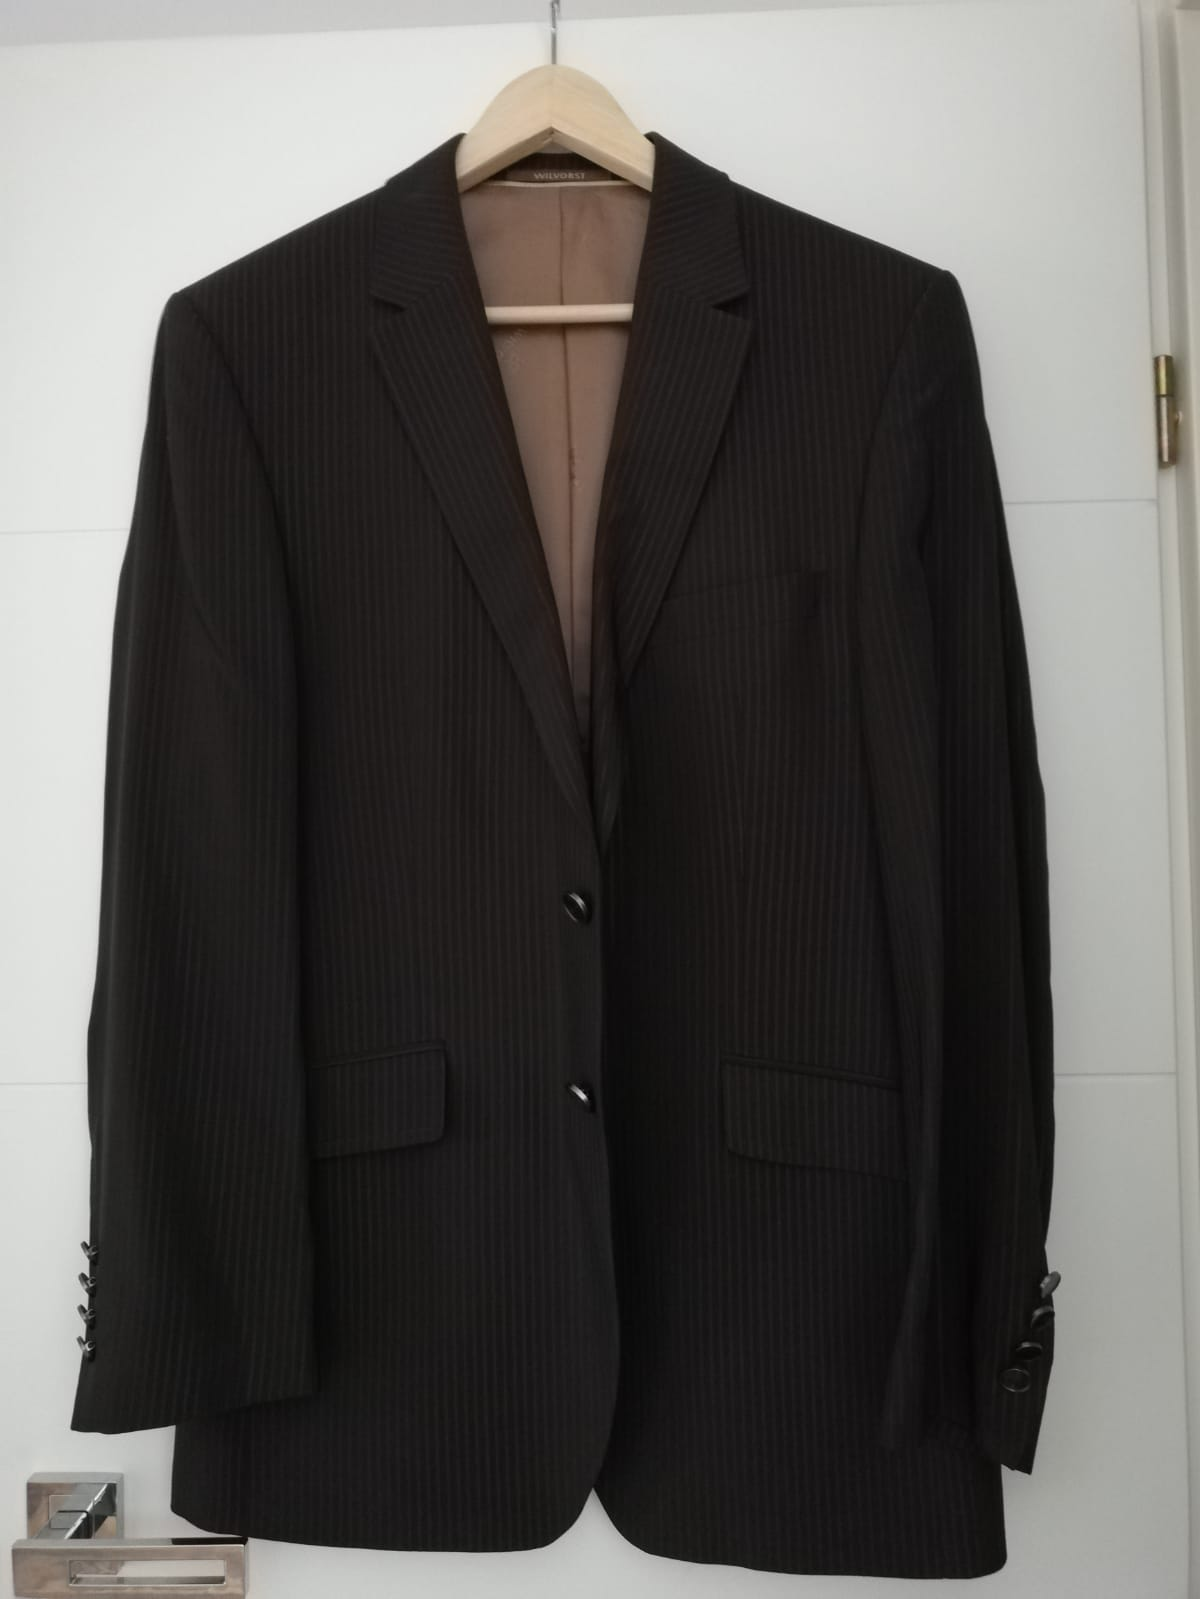 Pánsky oblek Wilvorst - Obrázok č. 3